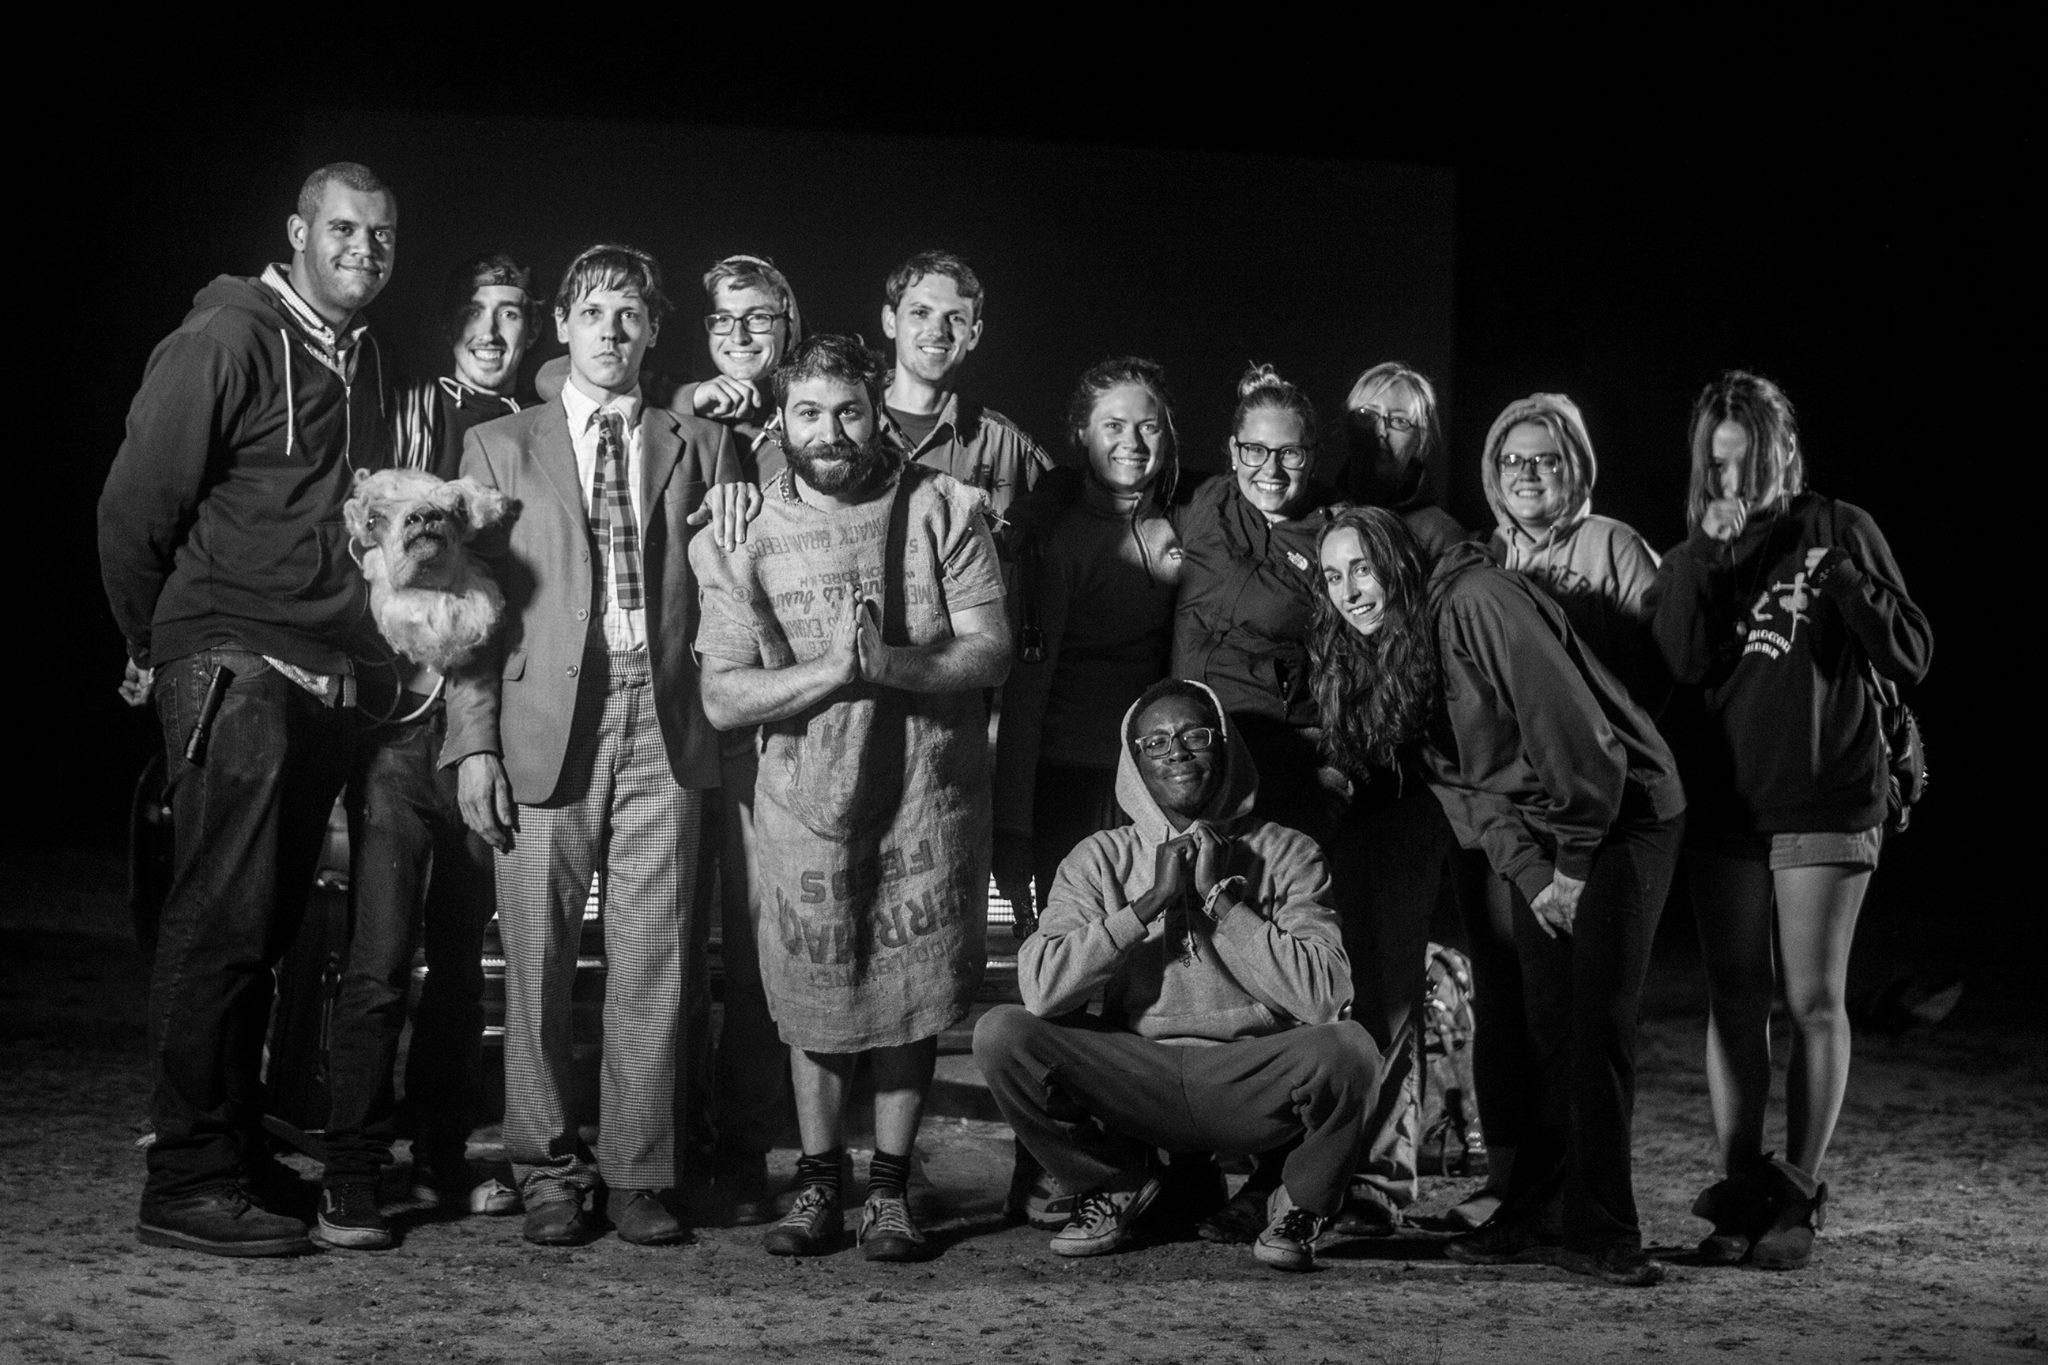 The Bloody Henryt Crew.jpg